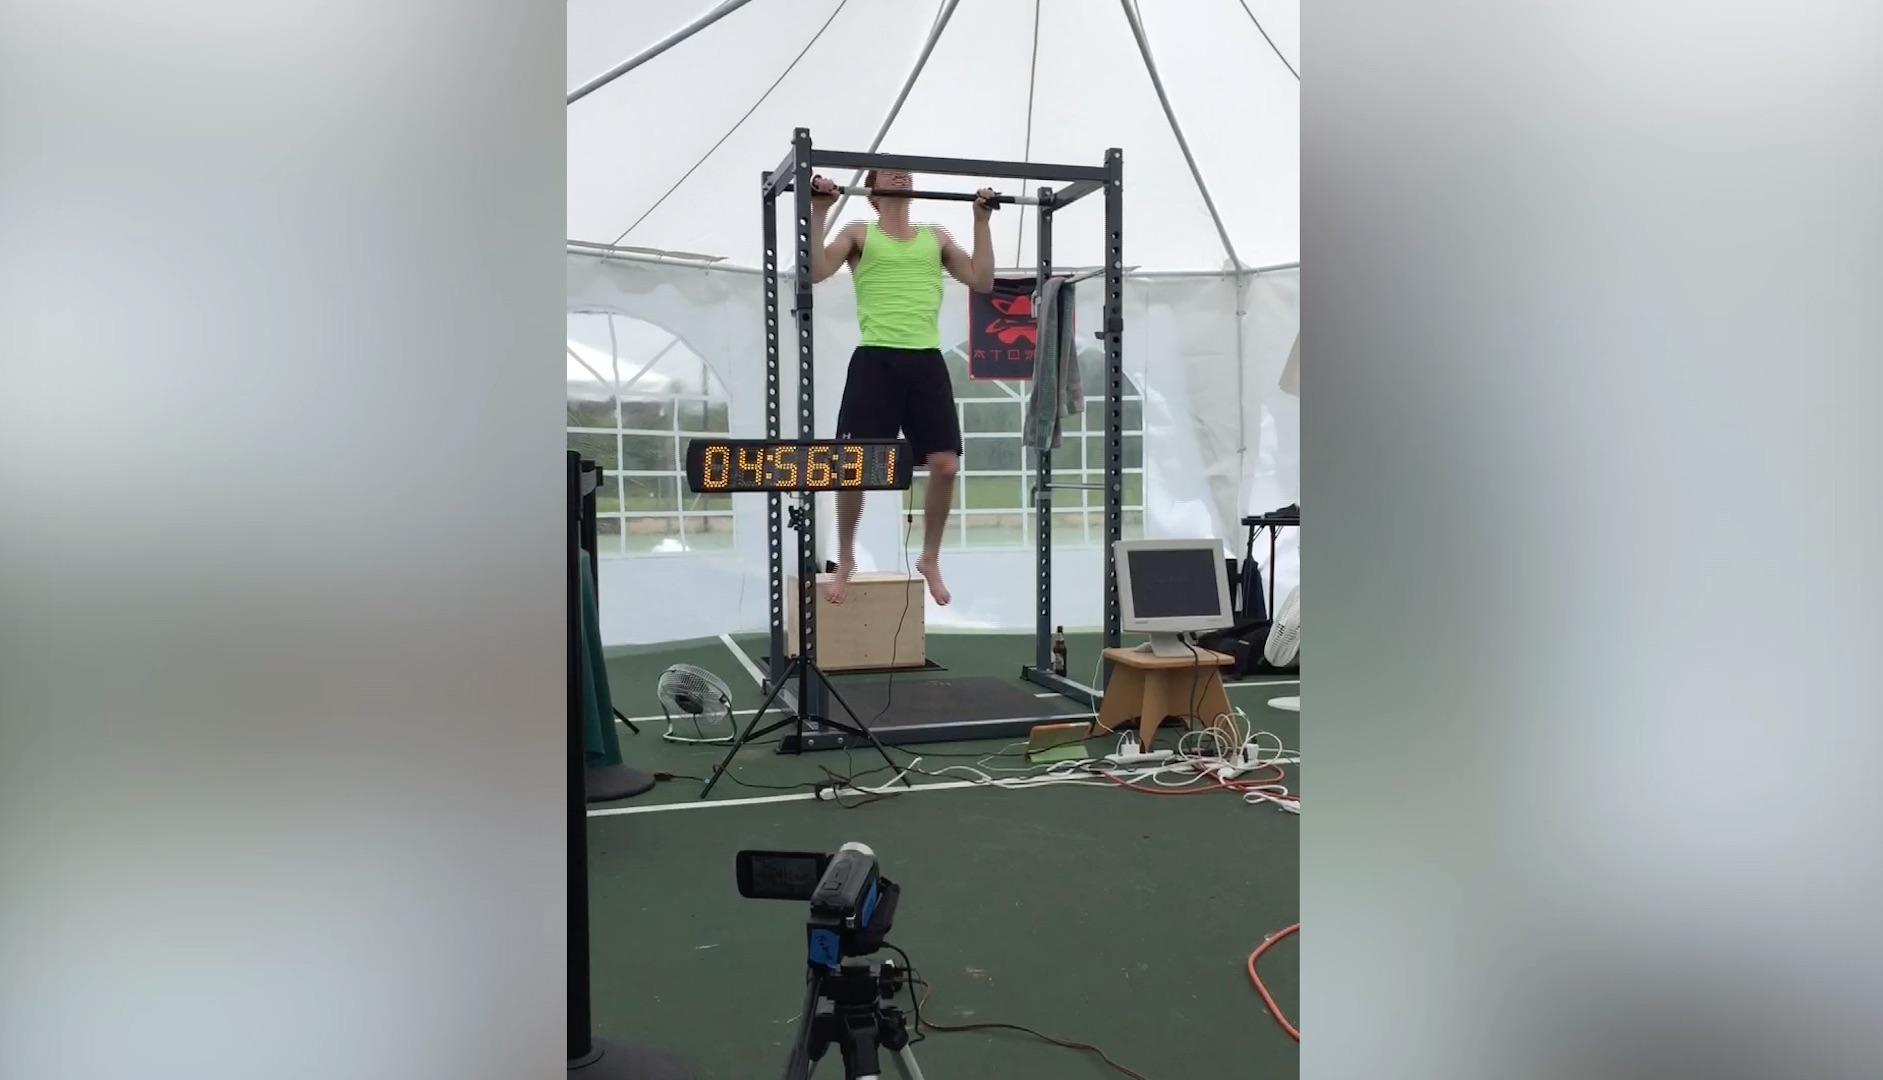 Watch a Va. teenager break three world records for pull-ups